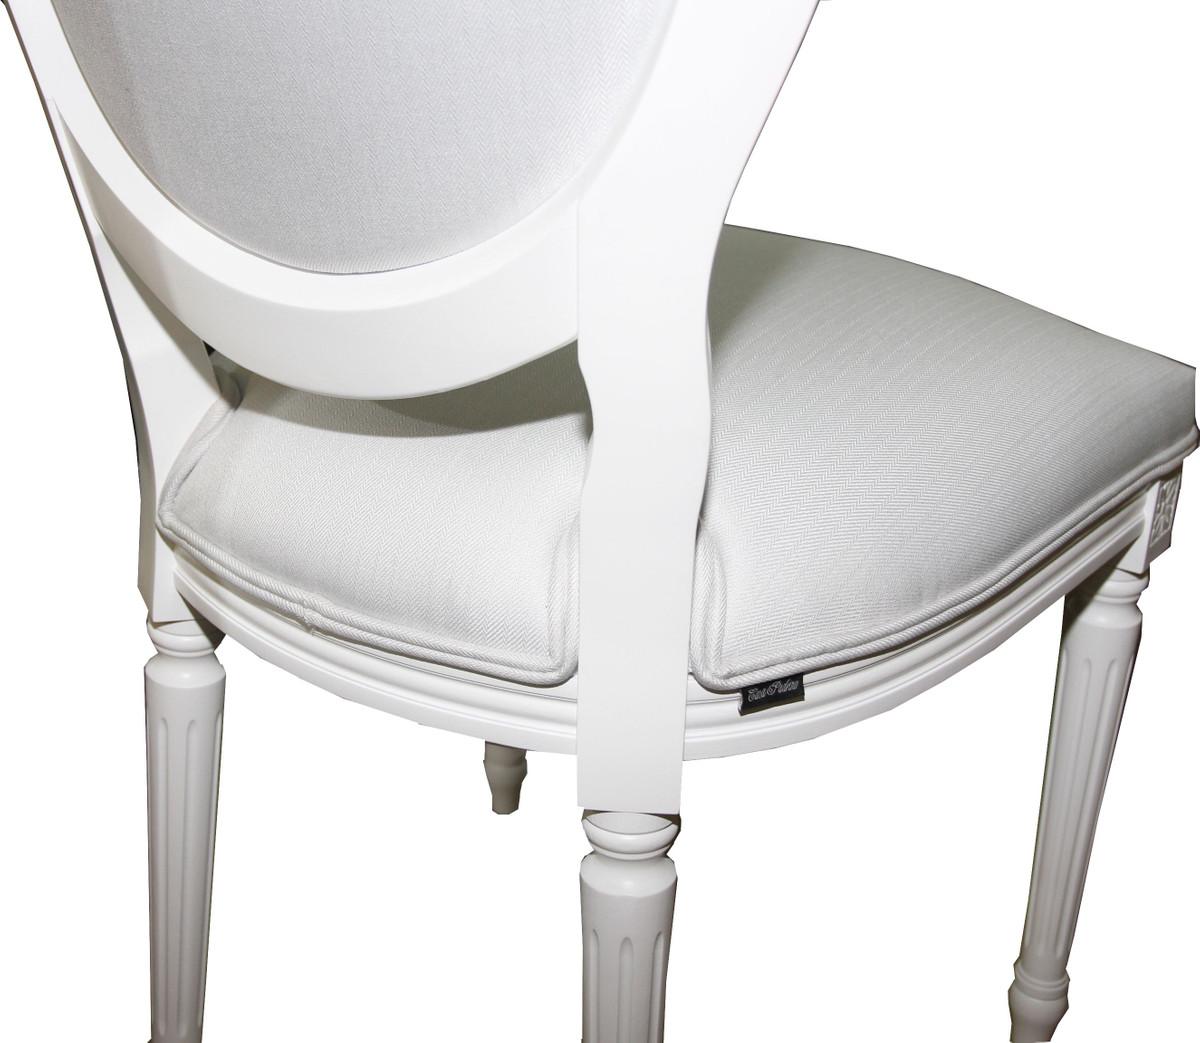 casa padrino luxus barock esszimmer stuhl wei wei luxus qualit t st hle barock st hle. Black Bedroom Furniture Sets. Home Design Ideas